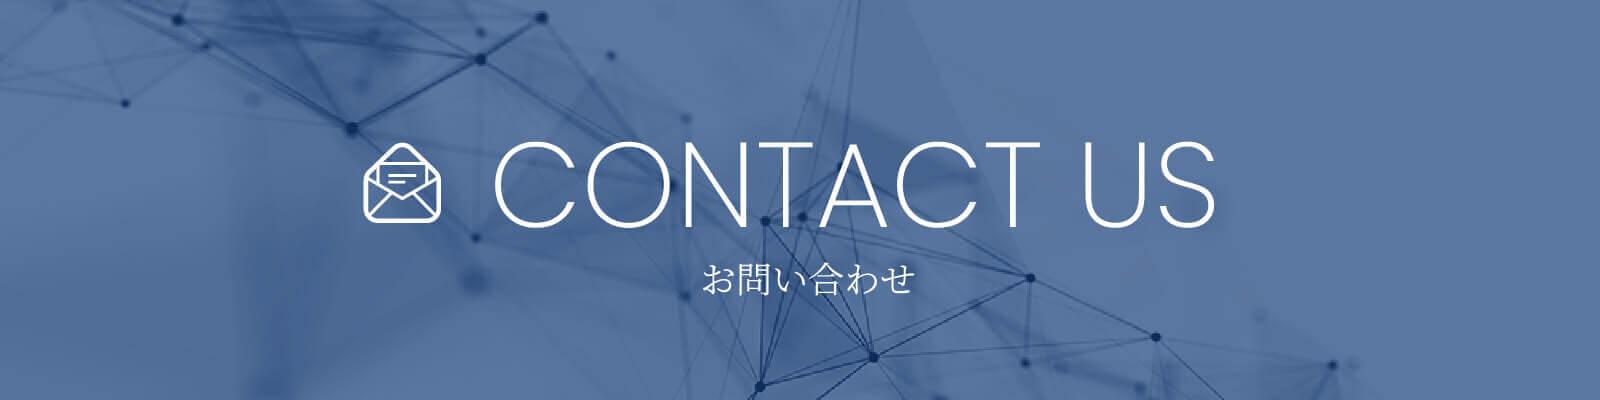 CONTACT US お問い合わせ